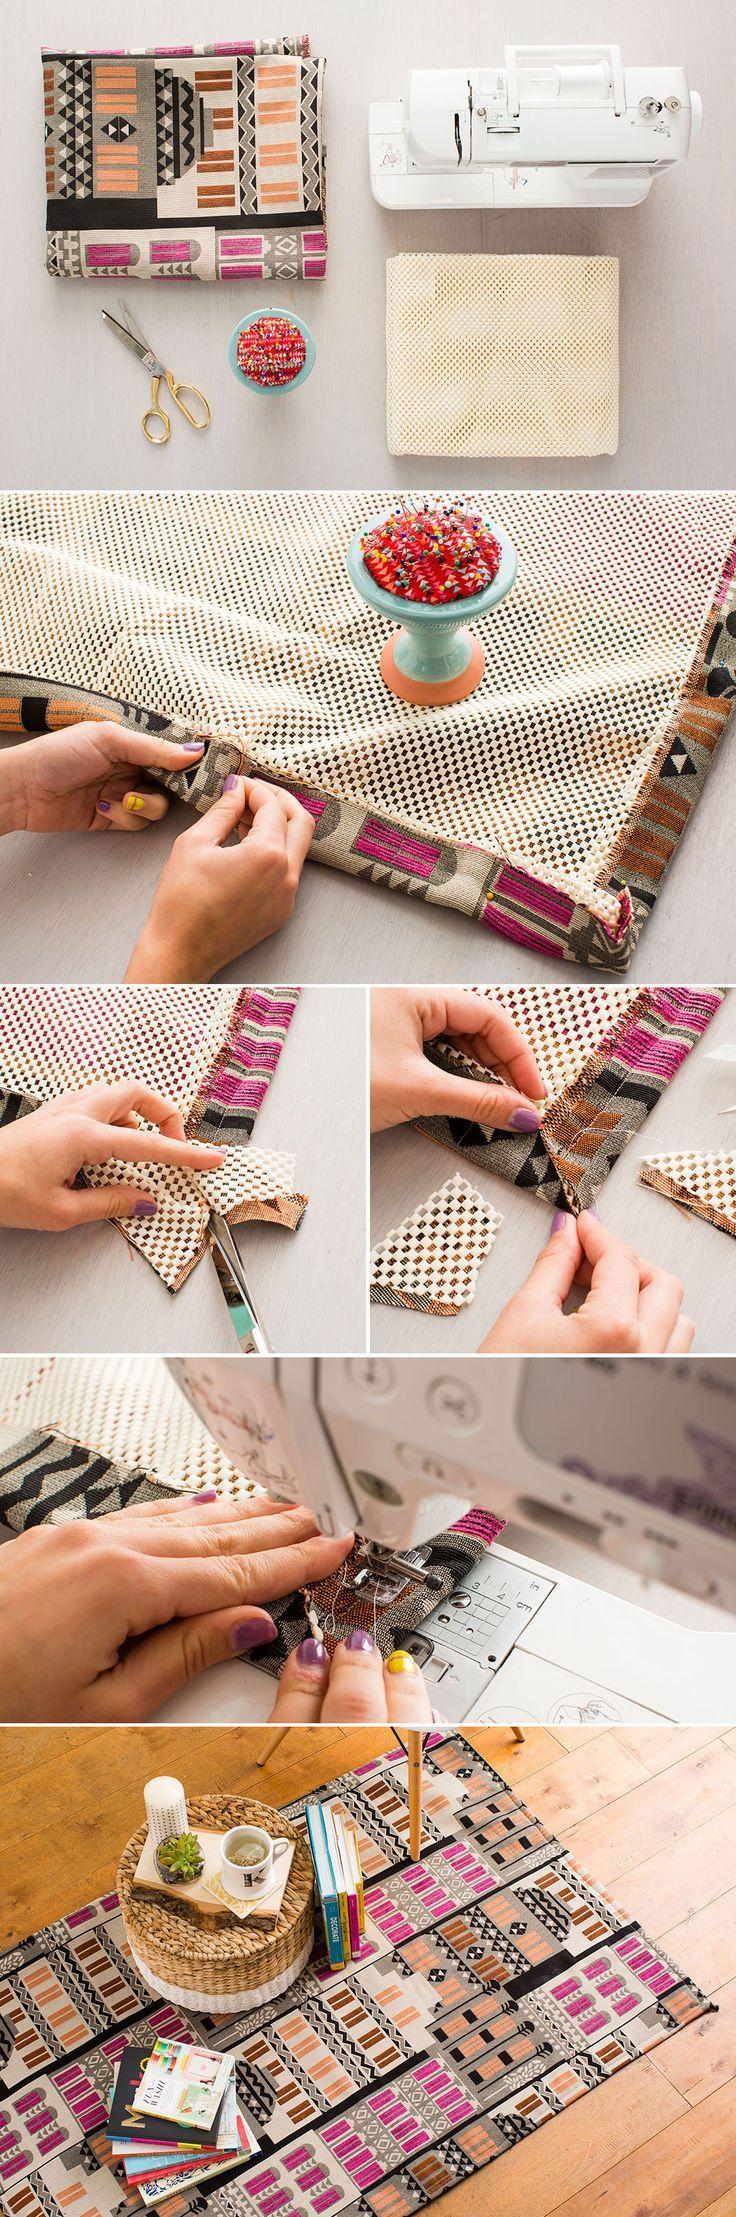 Fabric Rug Diy Best 20 Fabric Rug Ideas On Pinterest Homemade Rugs Rag Rug